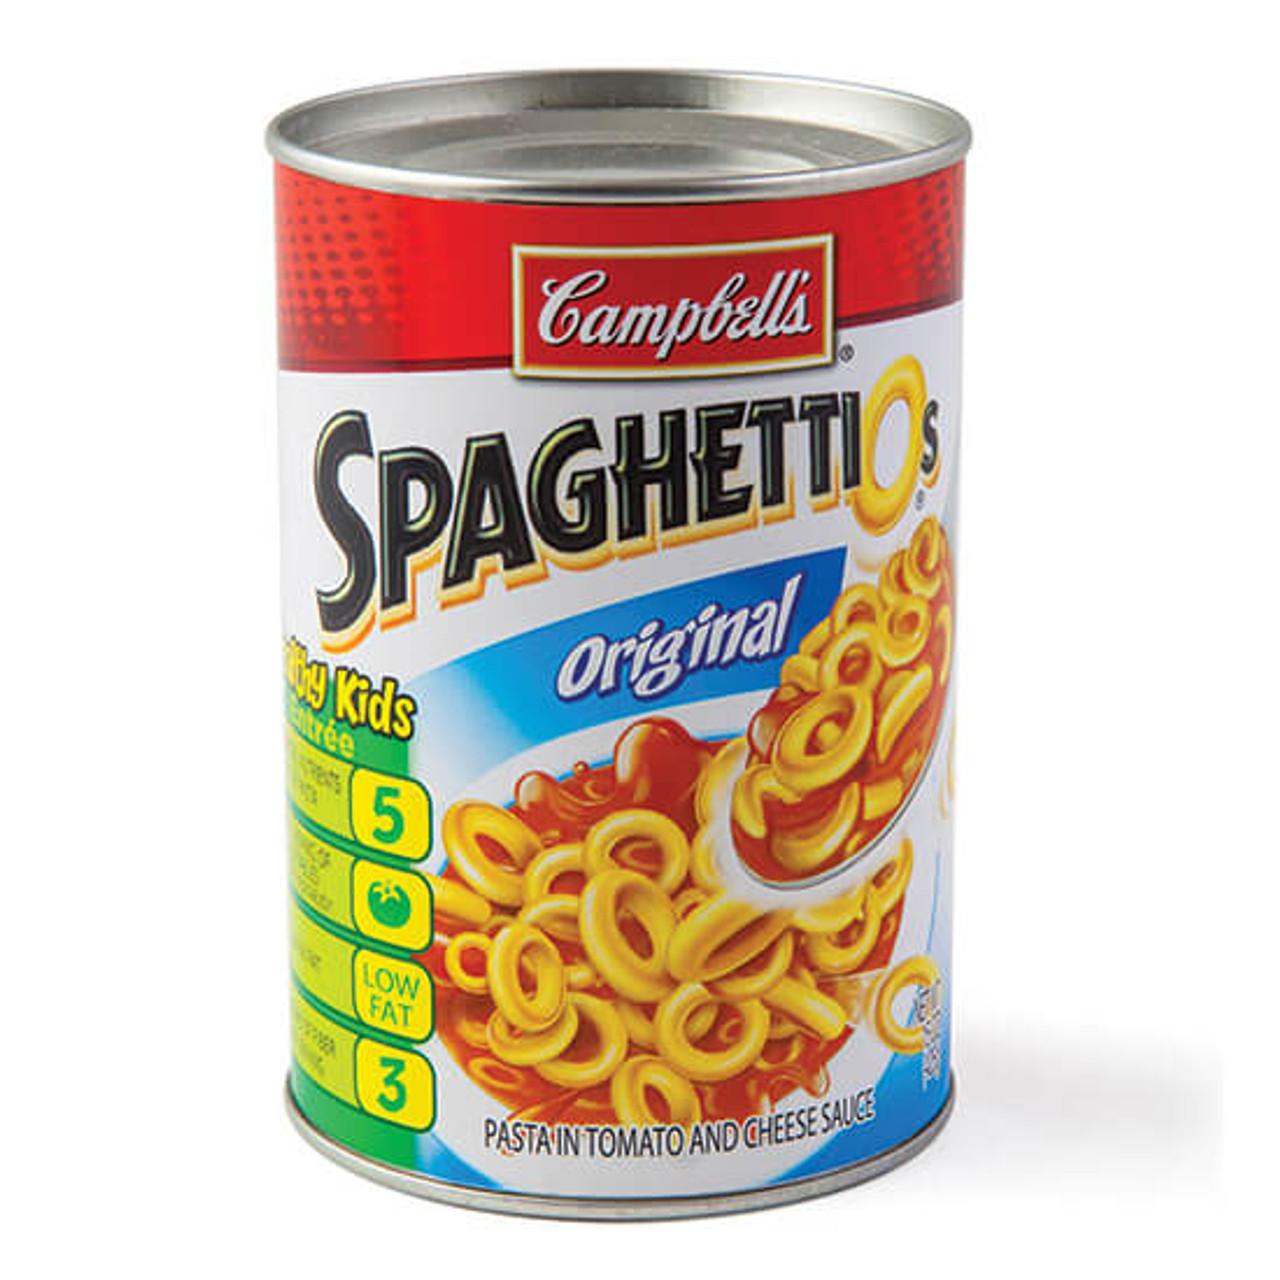 Spaghettios® Can Secret Decoy Safe